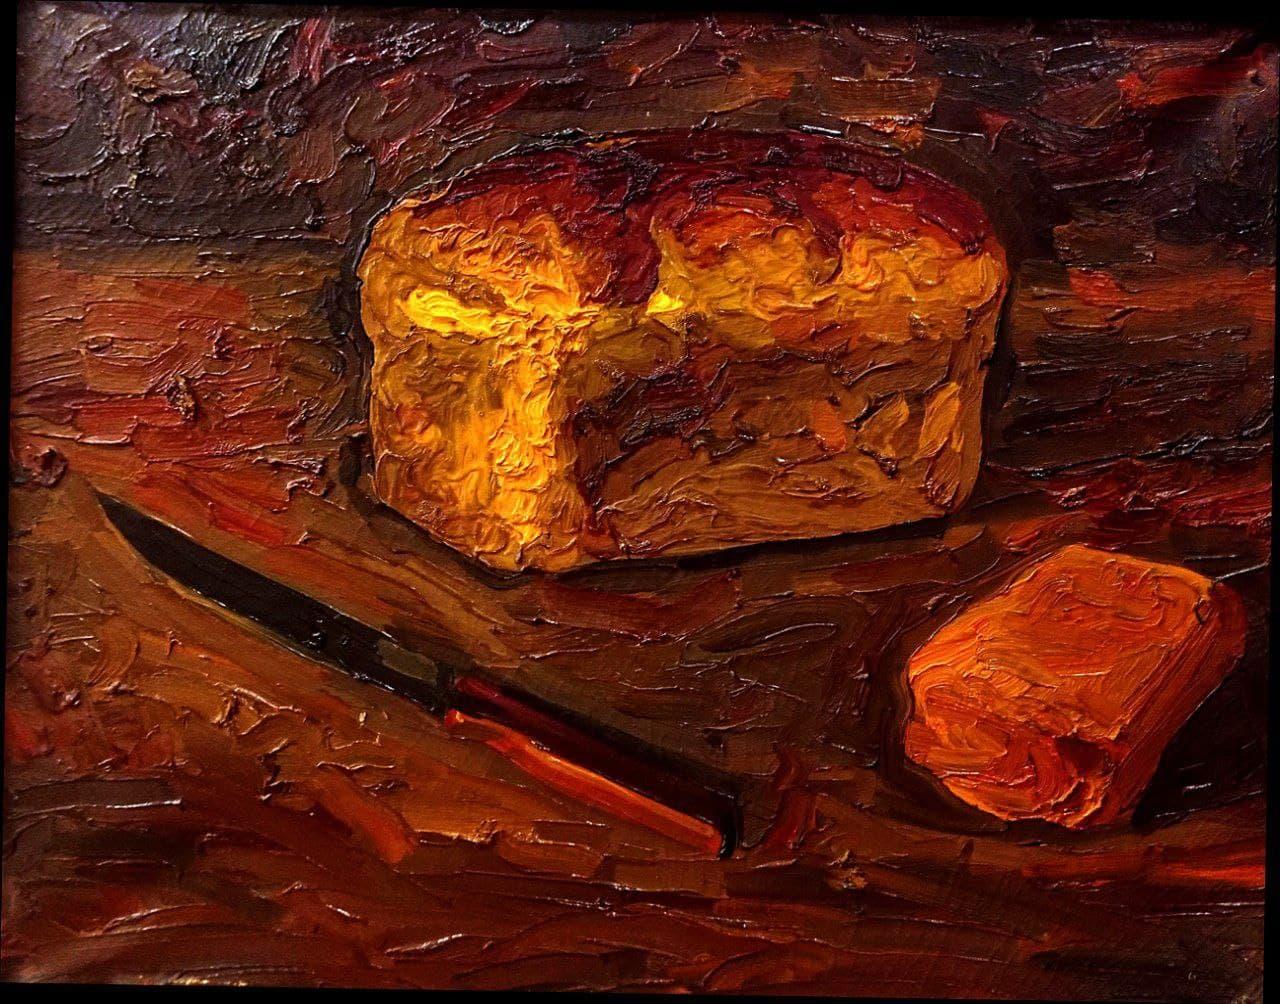 Эркин Жолдасов. Натюрморт с булкой хлеба и ножом